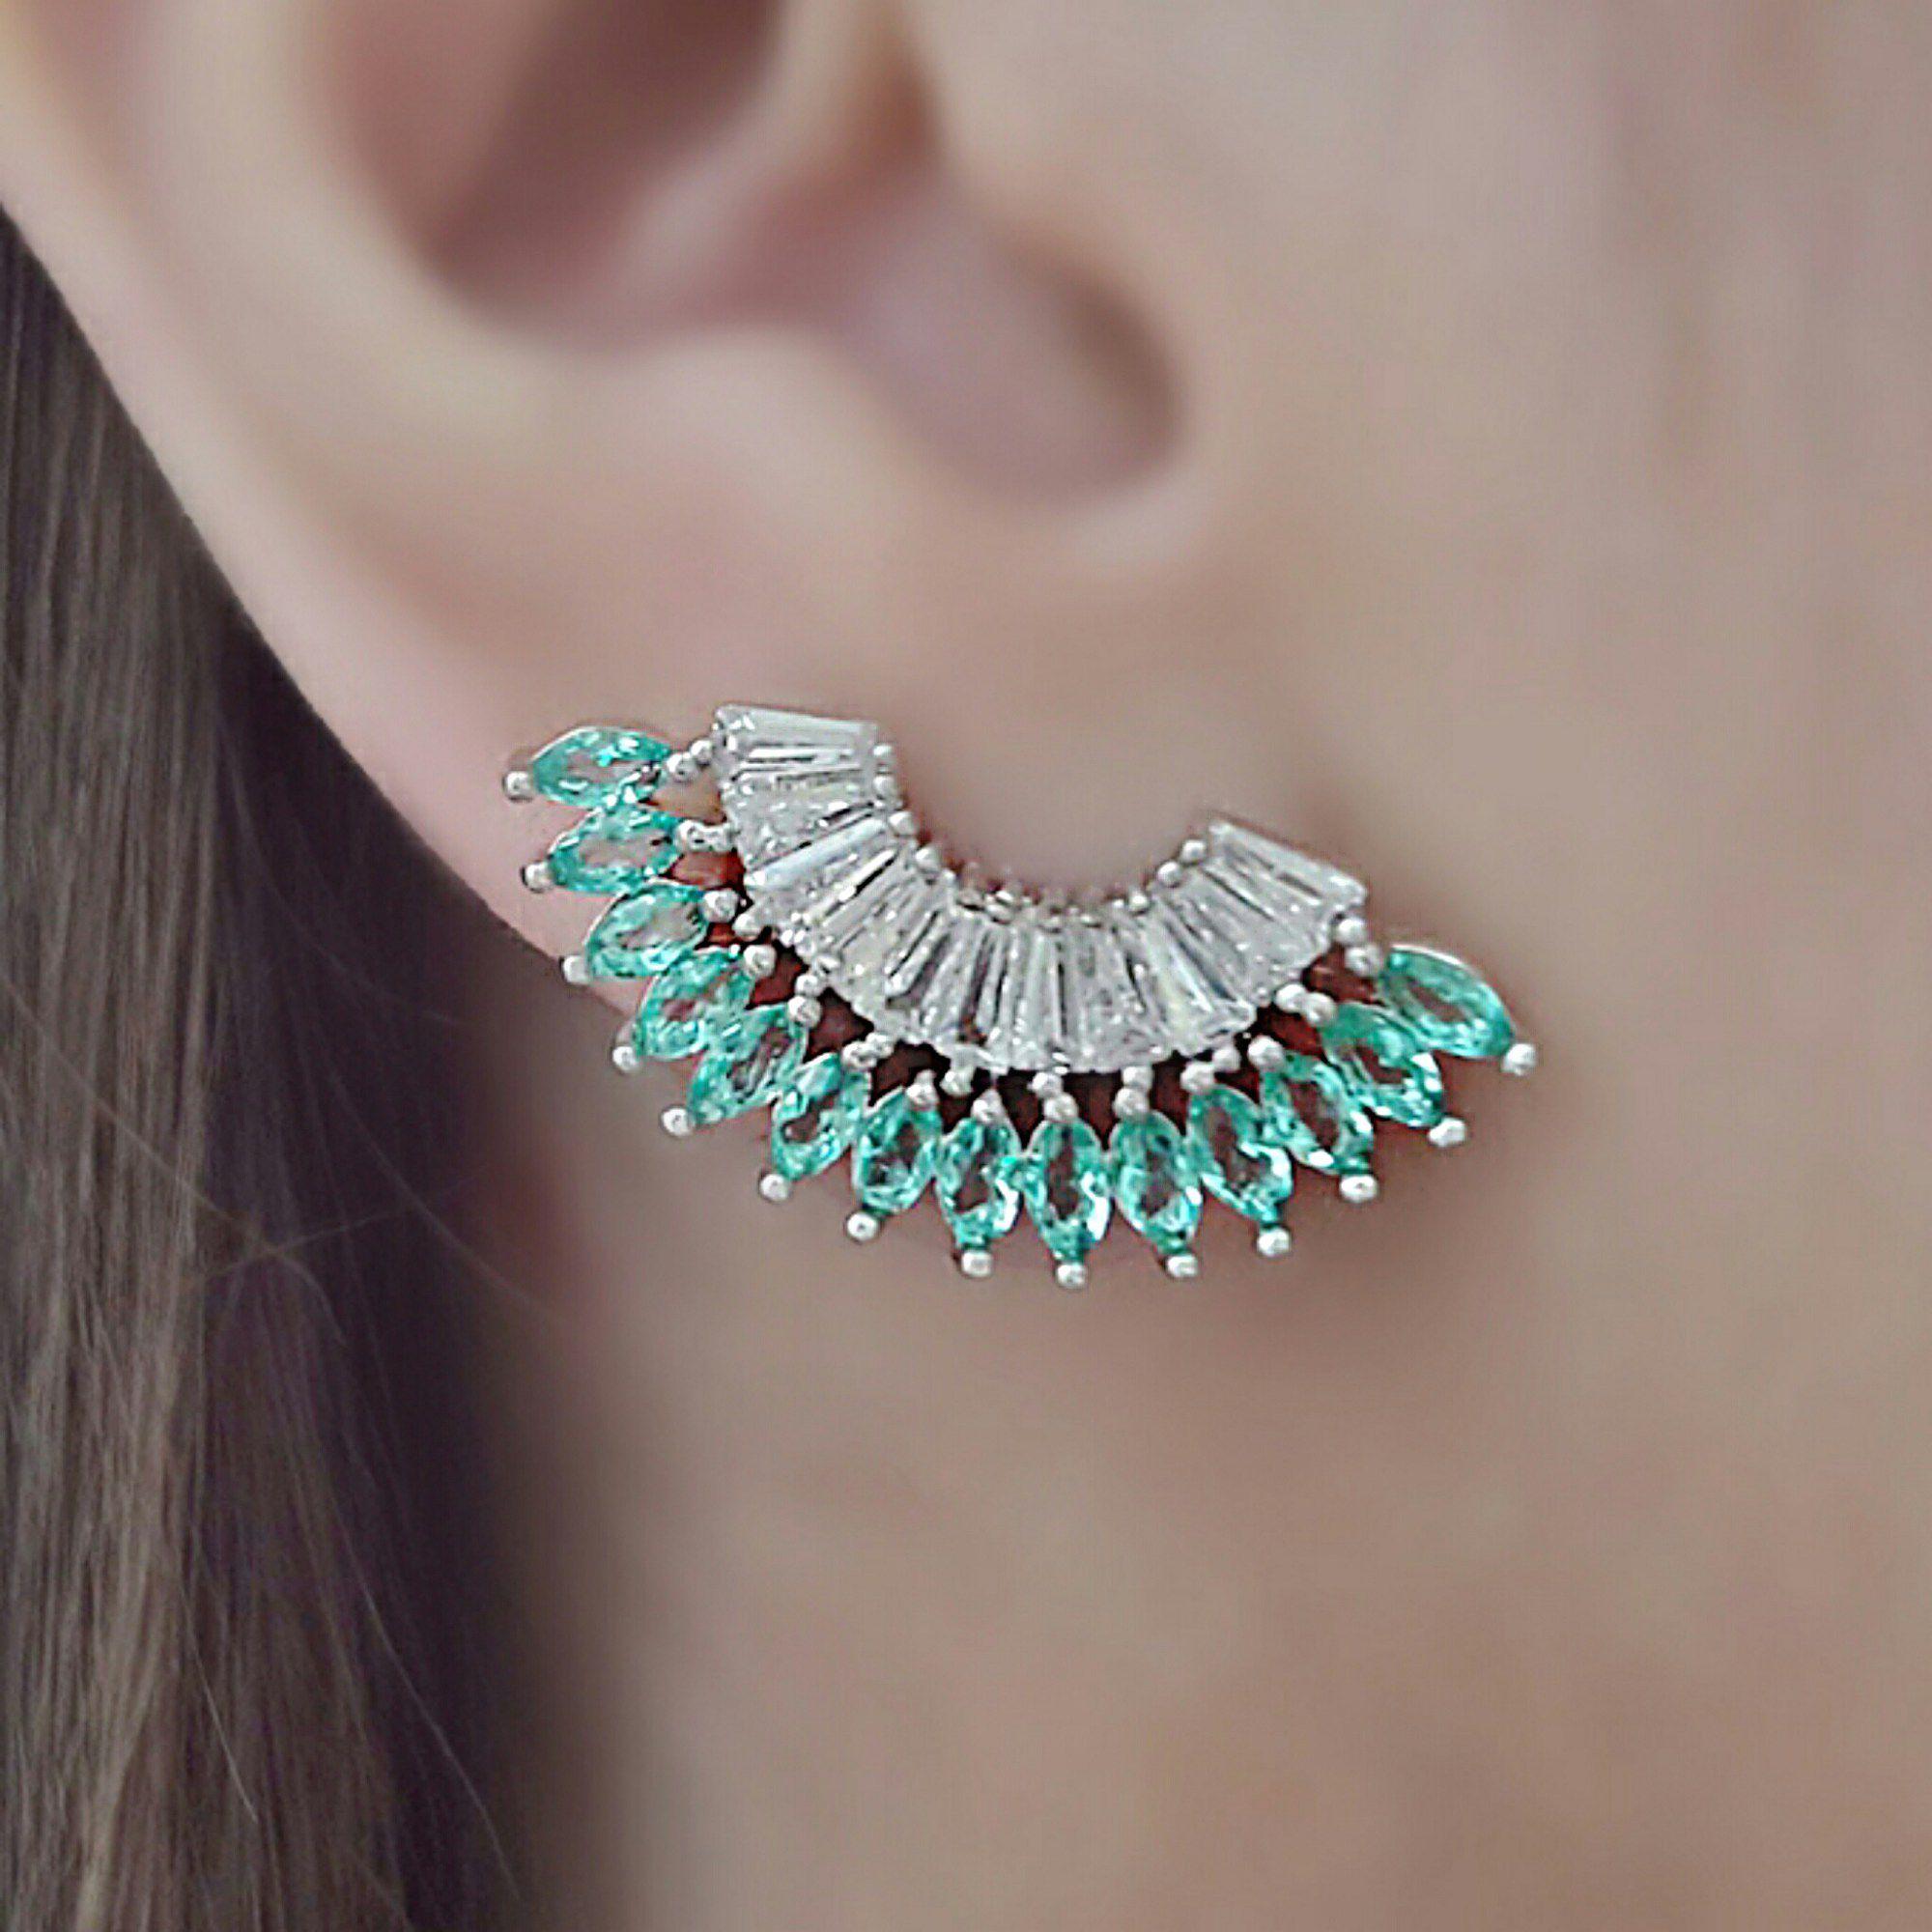 Brinco Ear Cuff de Zircônia Baguete Turmalina Semijoia em Ródio Branco  - Soloyou